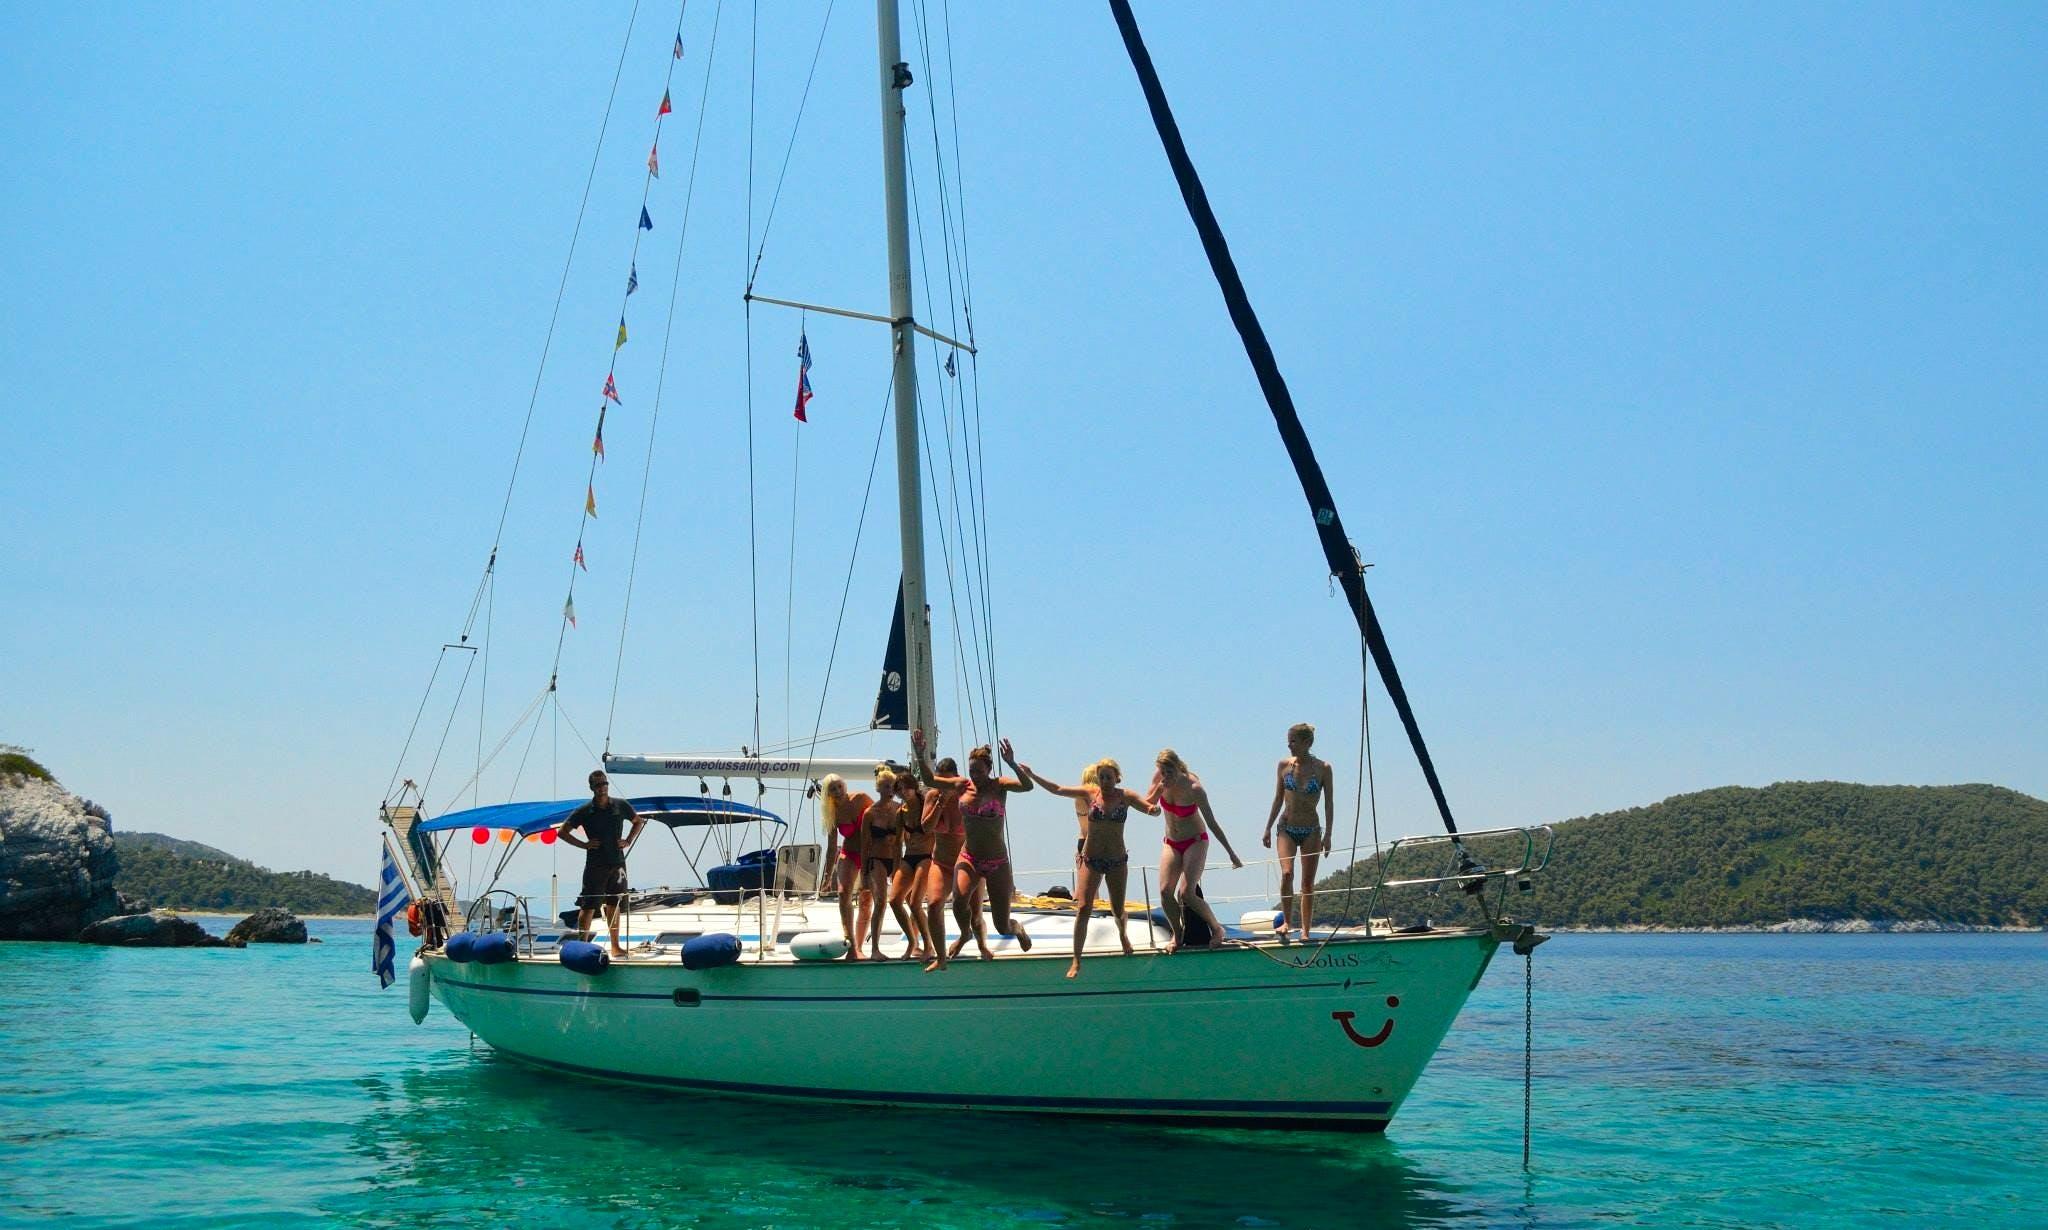 Cruising Monohull Rental in Σκιάθος